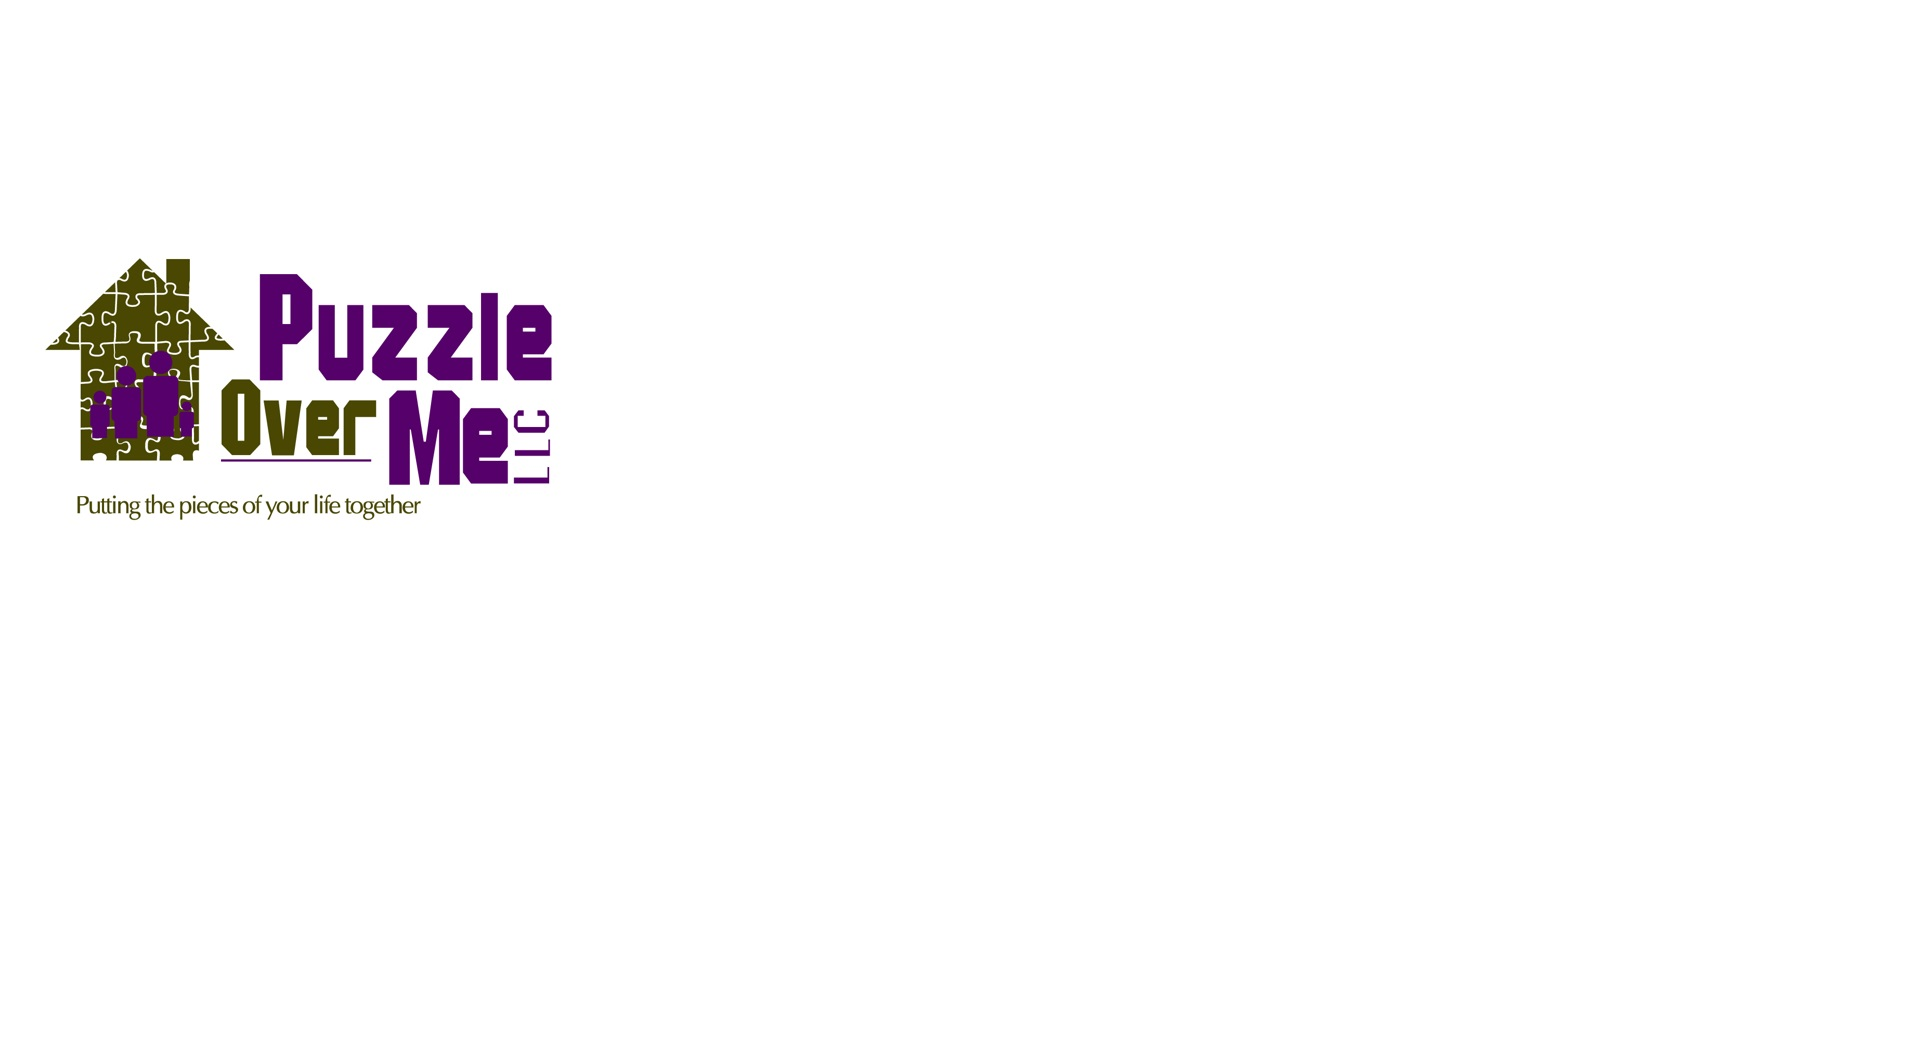 Puzzle Over Me LLC